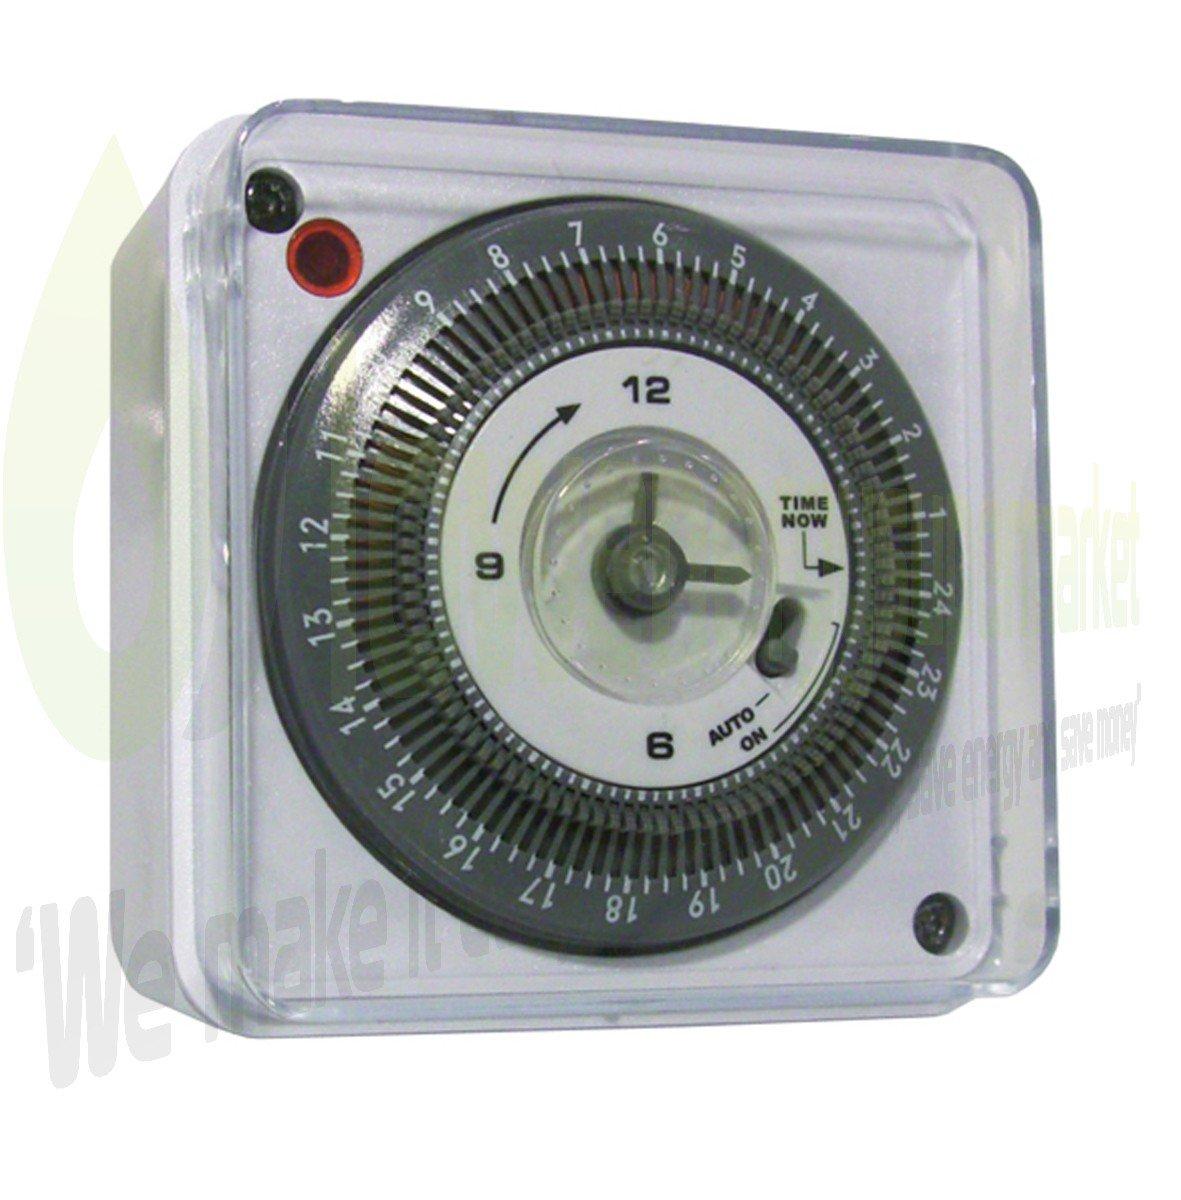 71L2yuXTX9L._SL1200_ lowenergie digital water immersion heater timer, 7 day immersion heater timer wiring diagram at creativeand.co